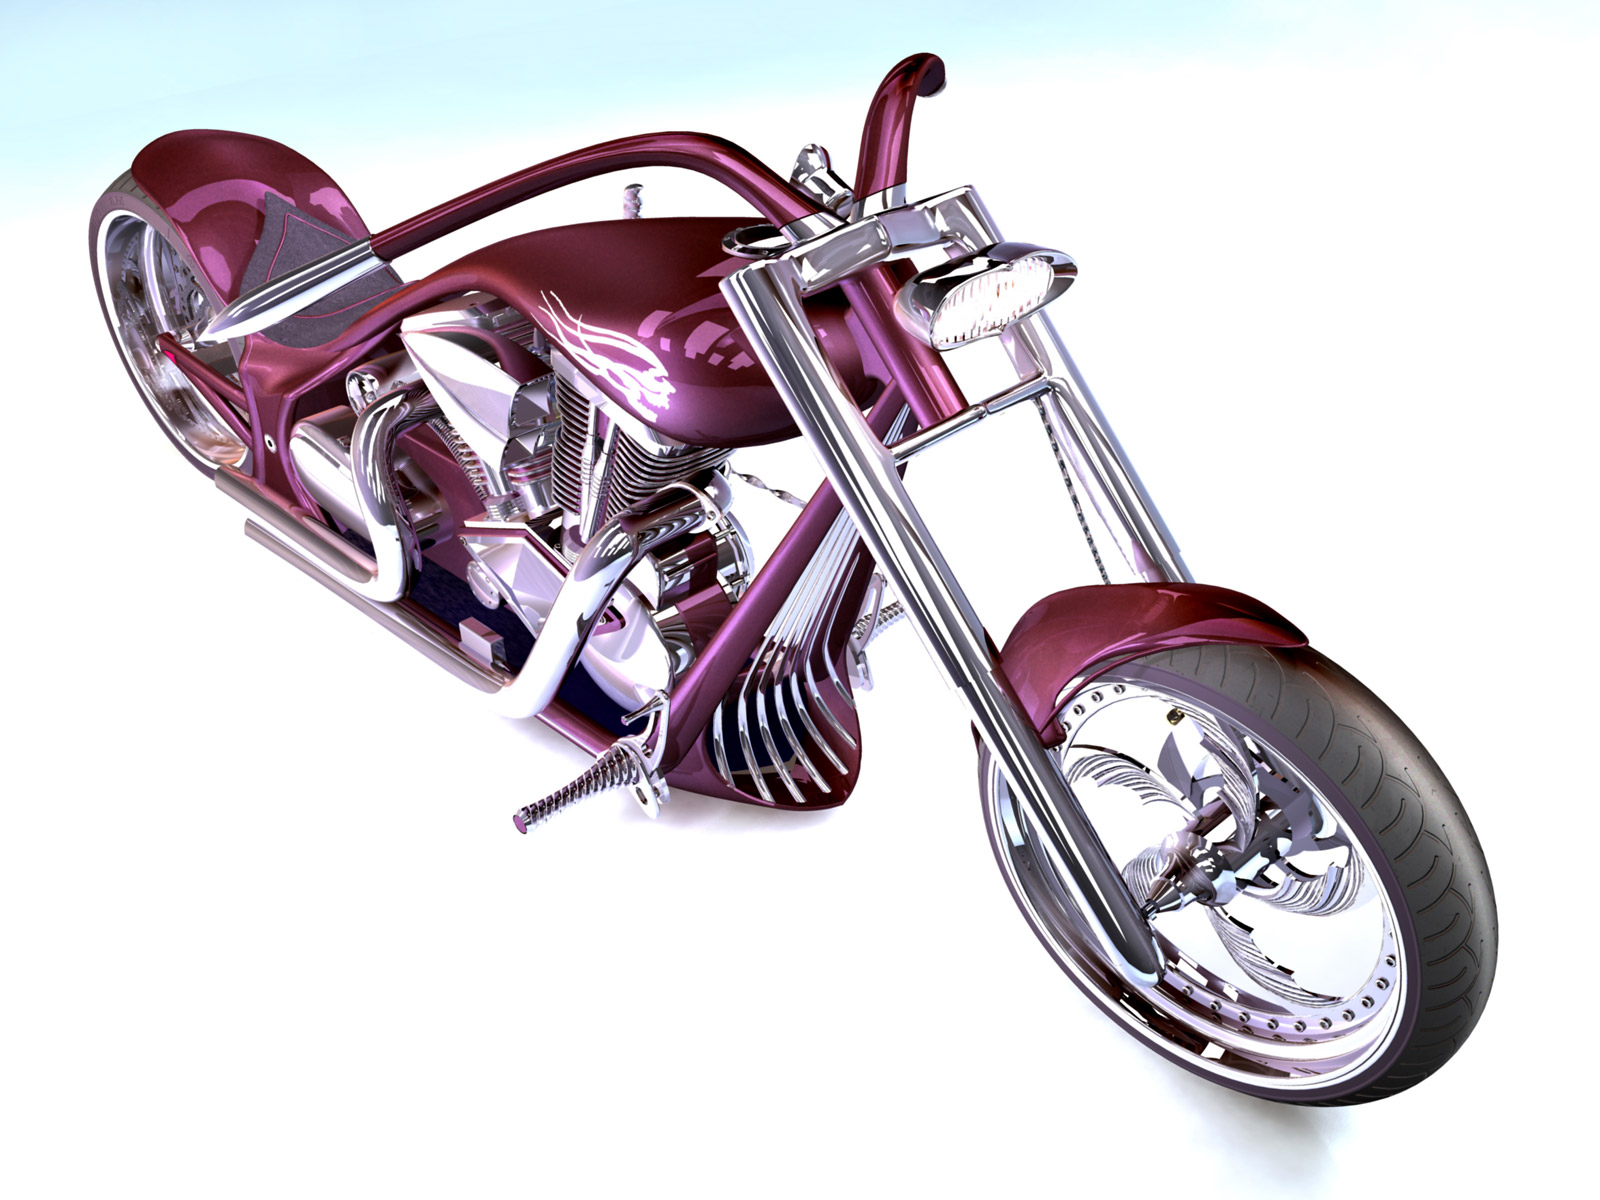 http://3.bp.blogspot.com/-x0q5-hRNaLE/Ttp16OXyYAI/AAAAAAAAAIM/pvRrW06gG_A/s1600/Wraith_Burg%252C_Chopper_Concept.jpg